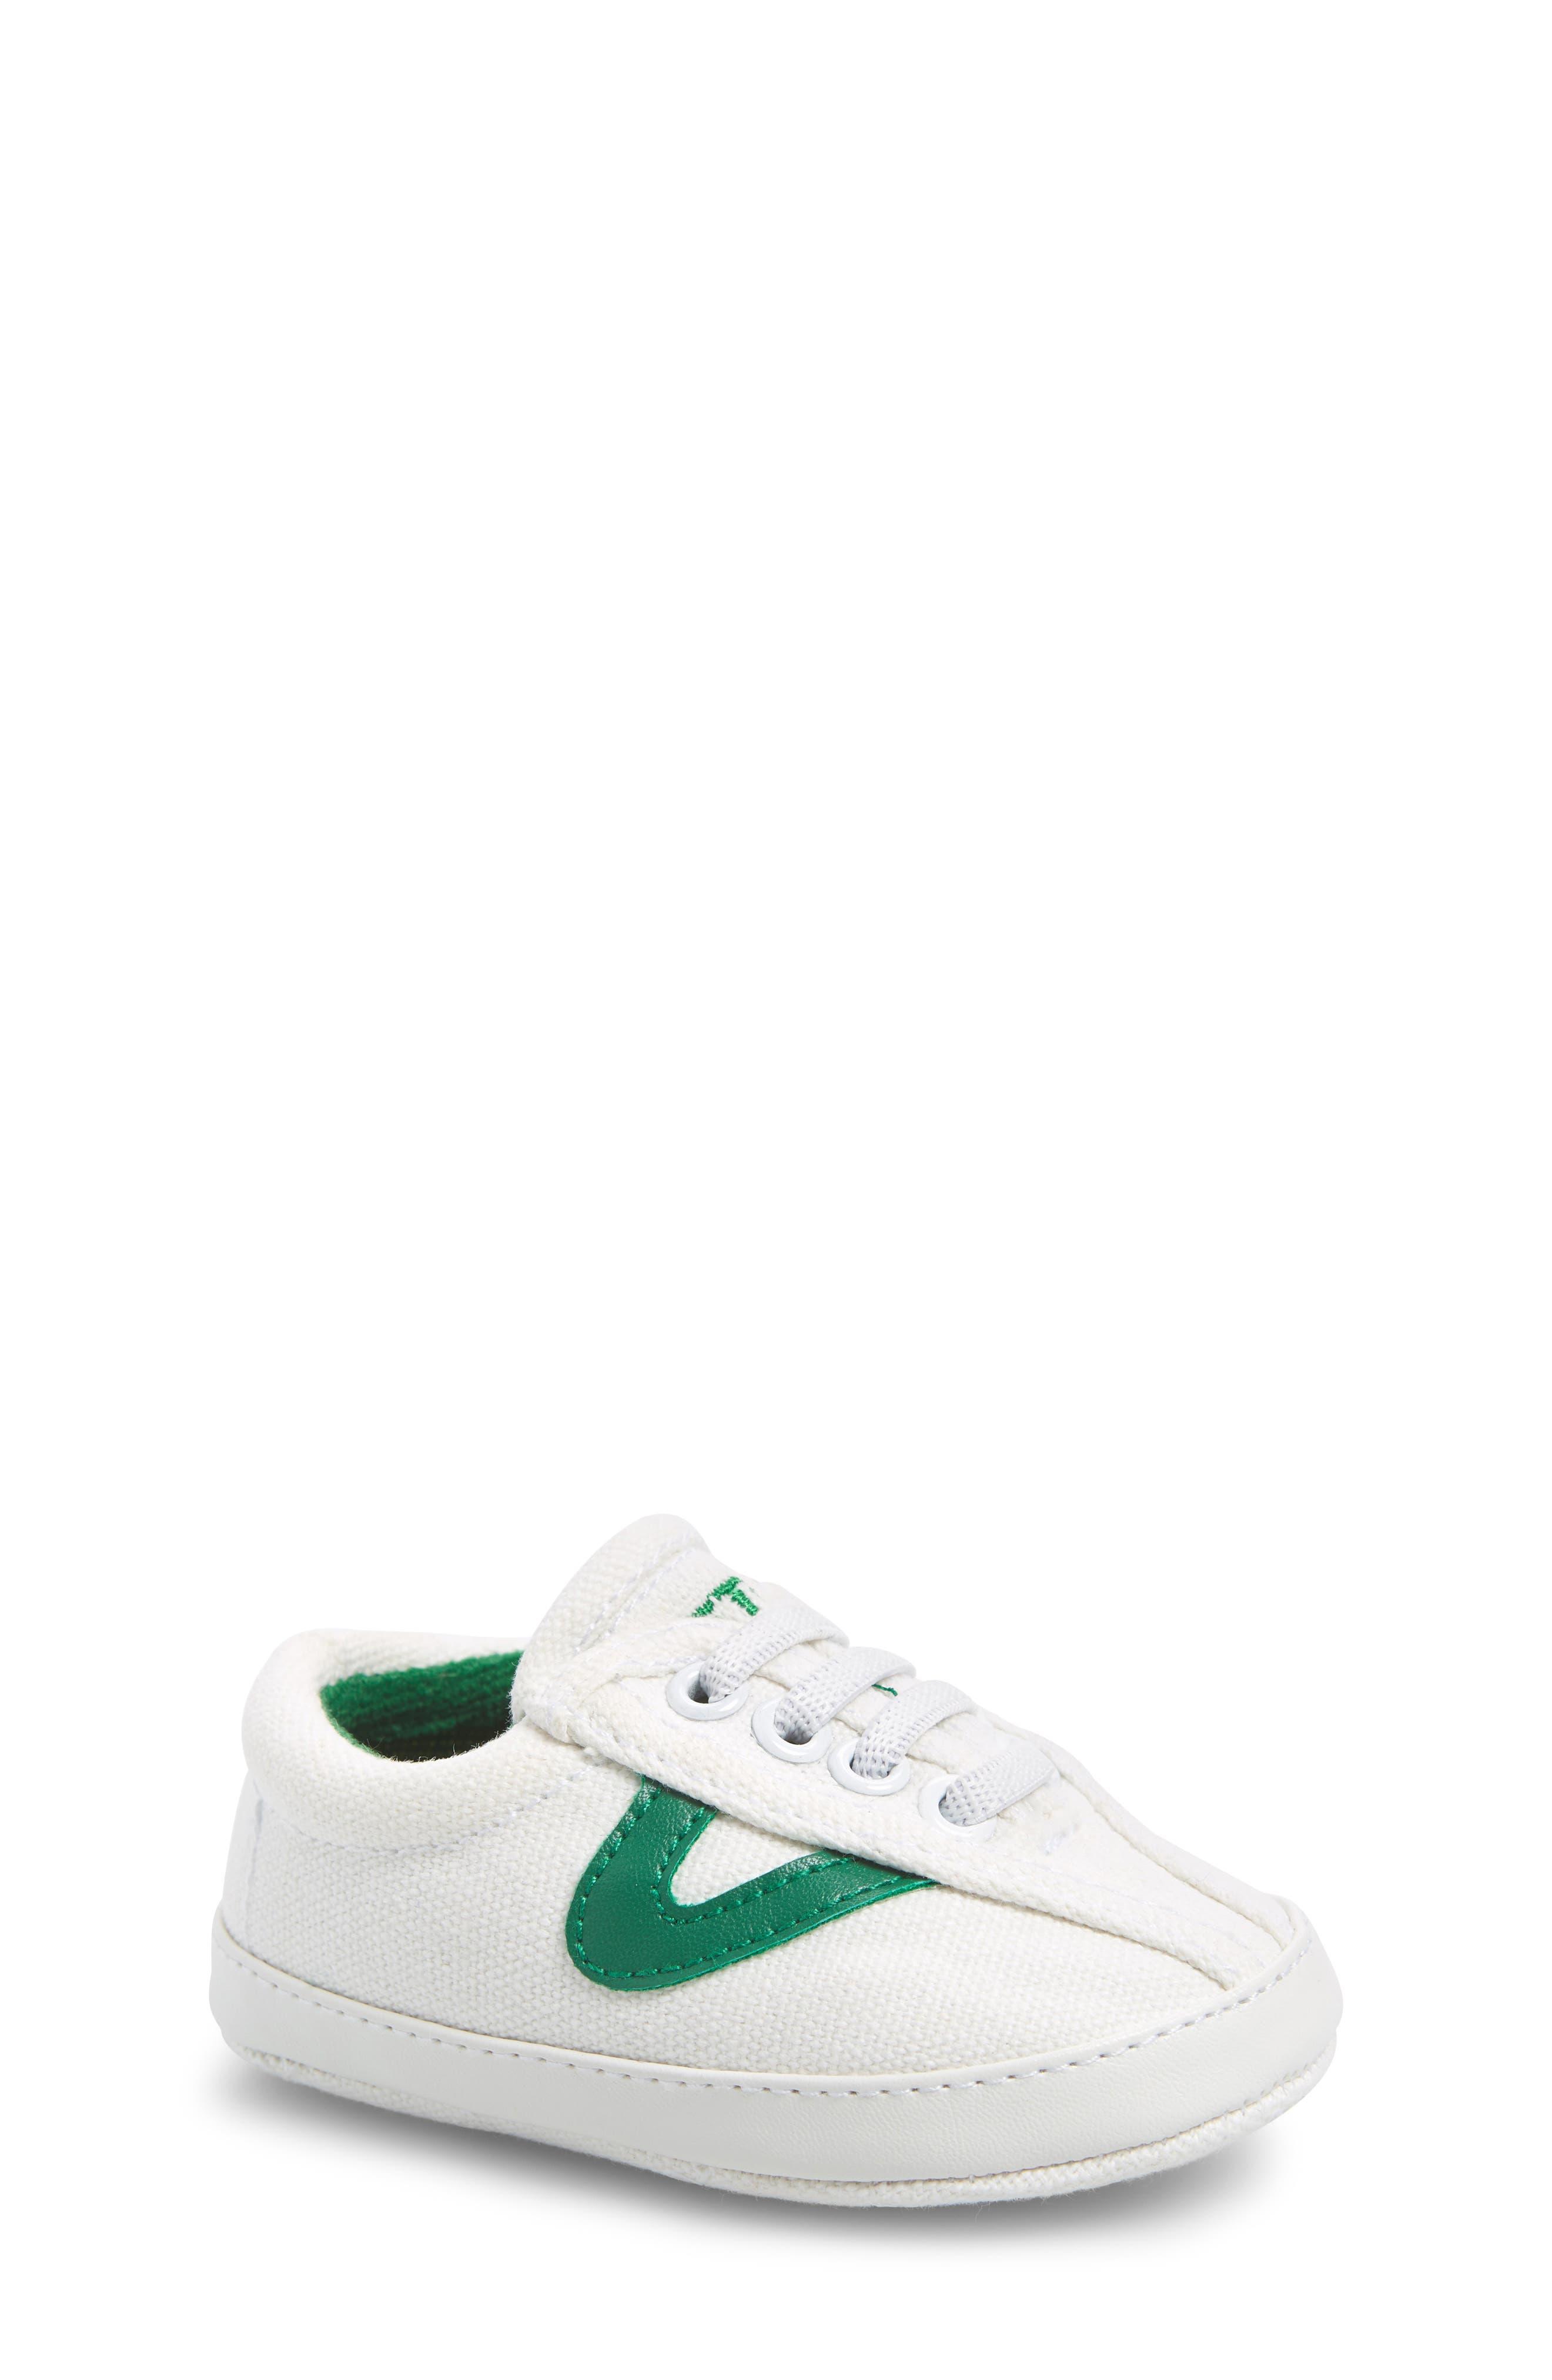 Nylite Plus Sneaker,                         Main,                         color, White/ Green